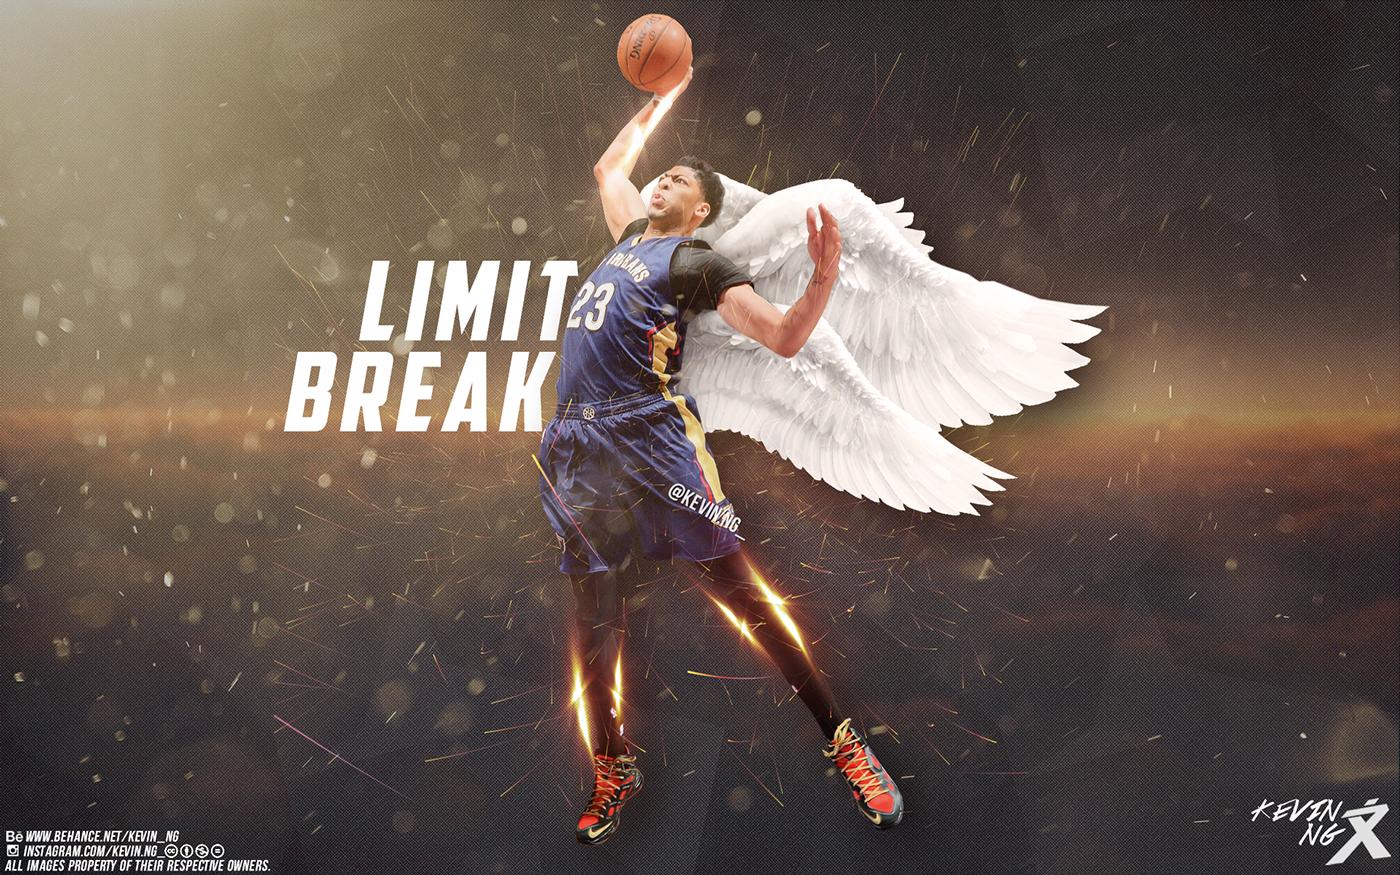 Download Anthony Davis Limit Break Wallpaper on Behance [1400x875 1400x875